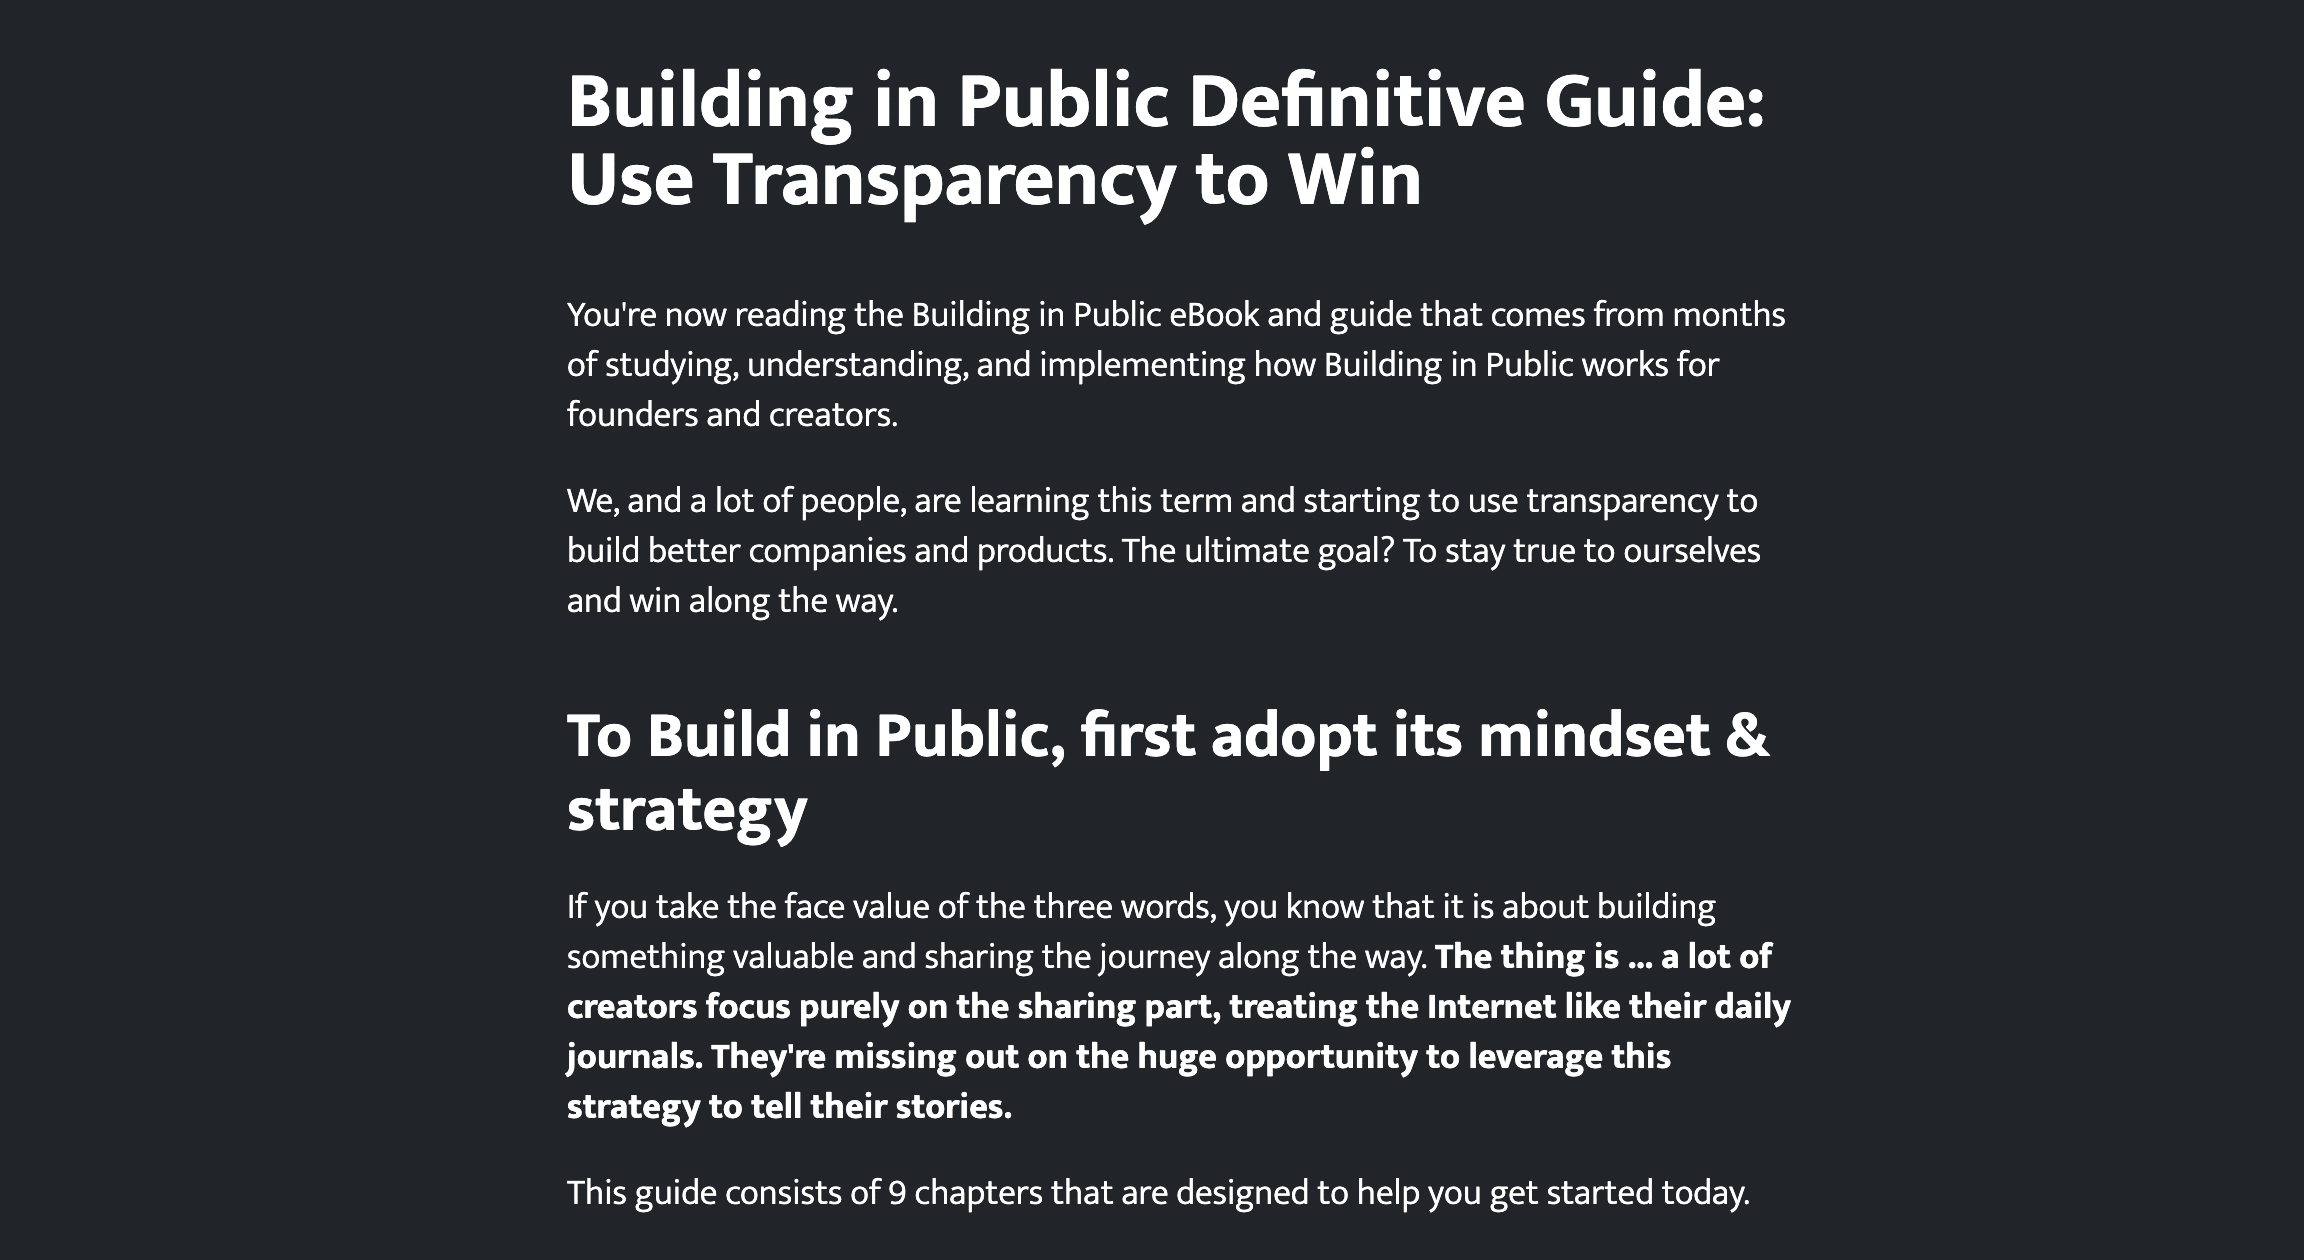 Building in Public Definitive Guide